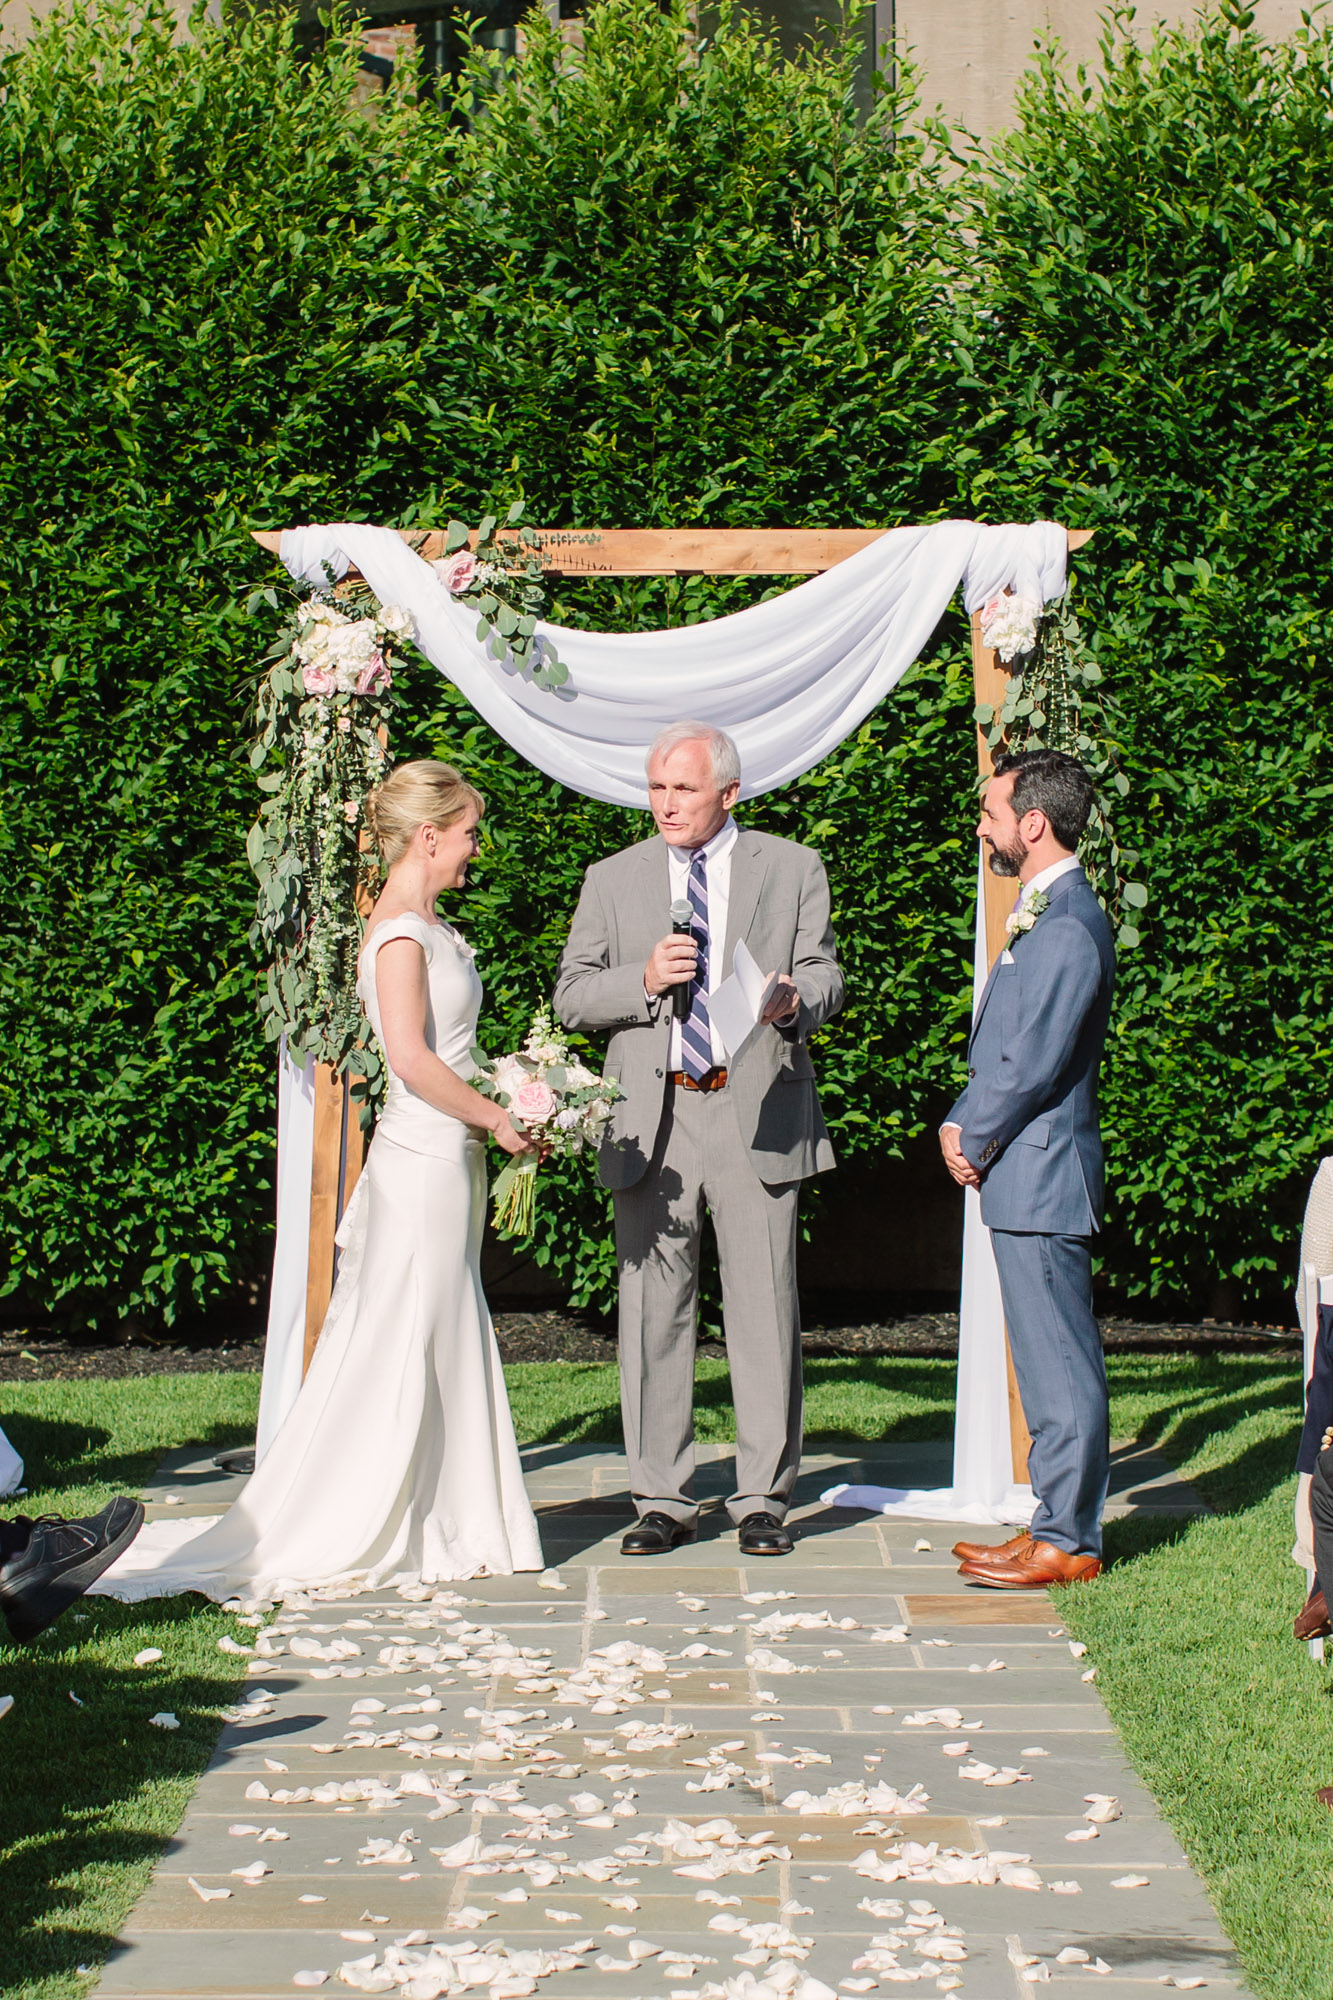 44_Rowan_Brian_The_Roundhouse_Wedding_Beacon_NY_Tanya_Salazar_Photography_530.jpg